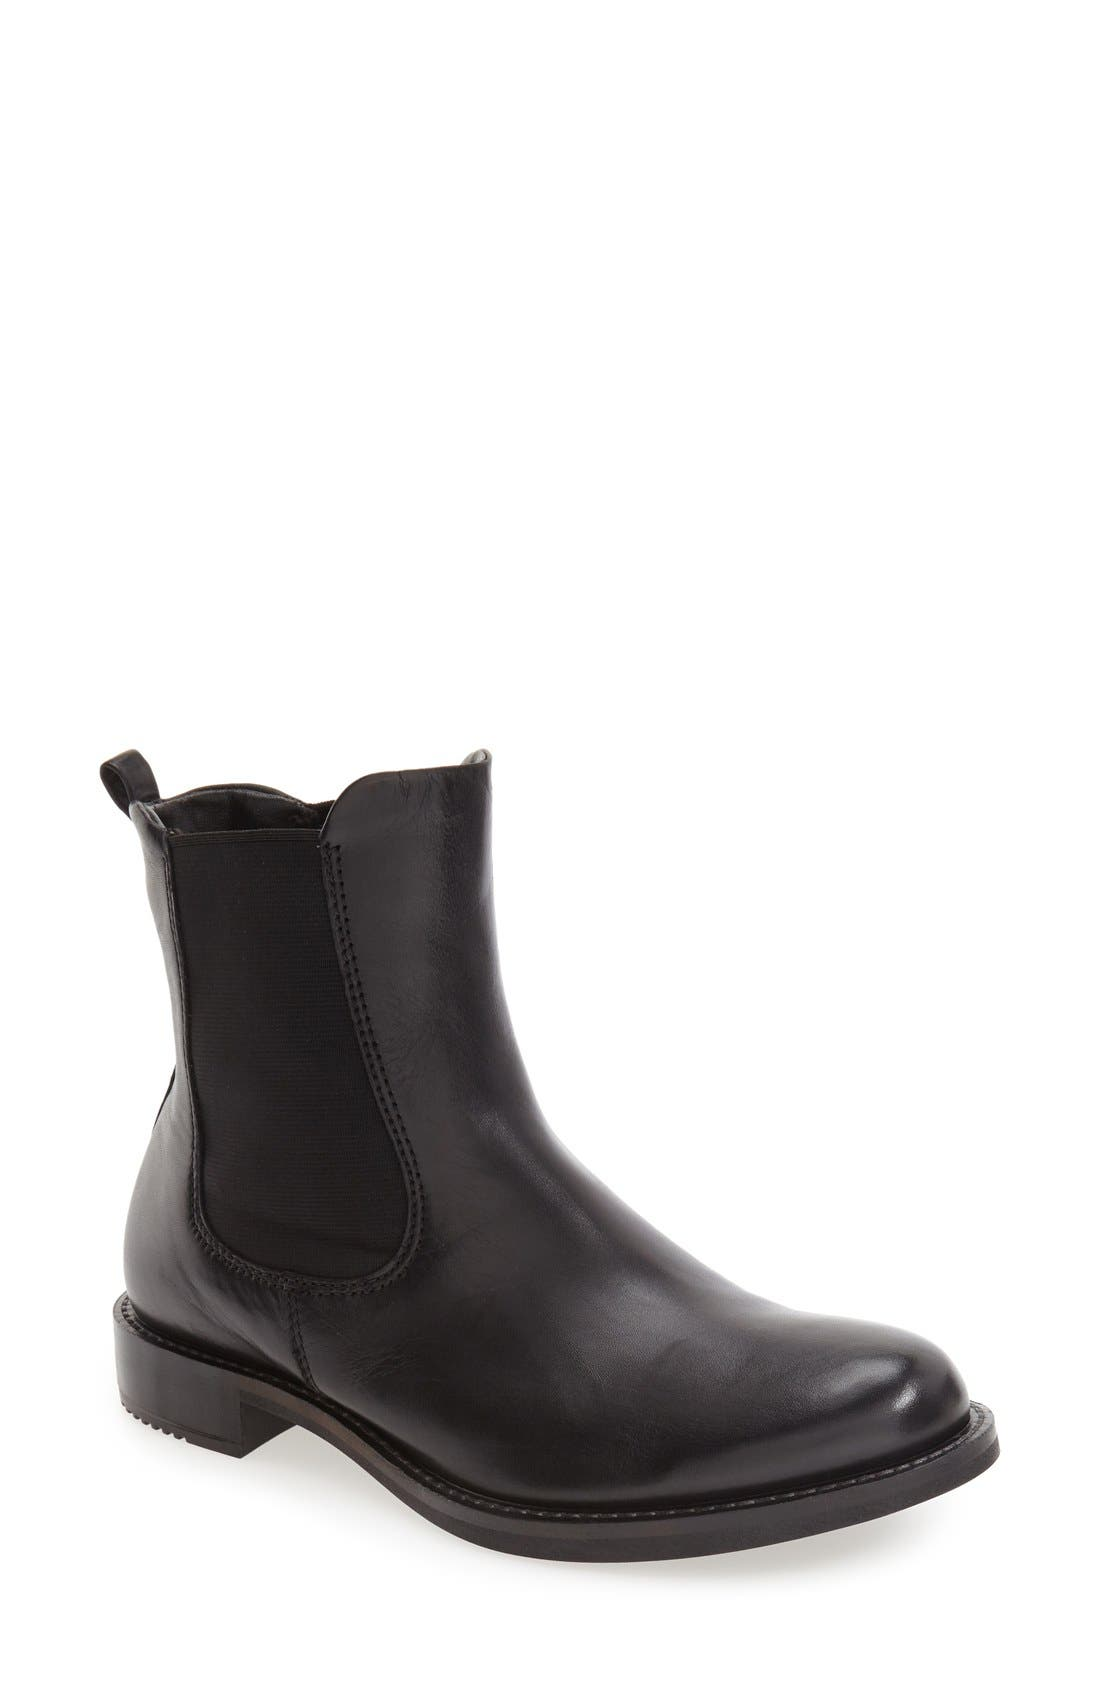 'Shape 25' Chelsea Boot,                             Main thumbnail 1, color,                             Black Leather